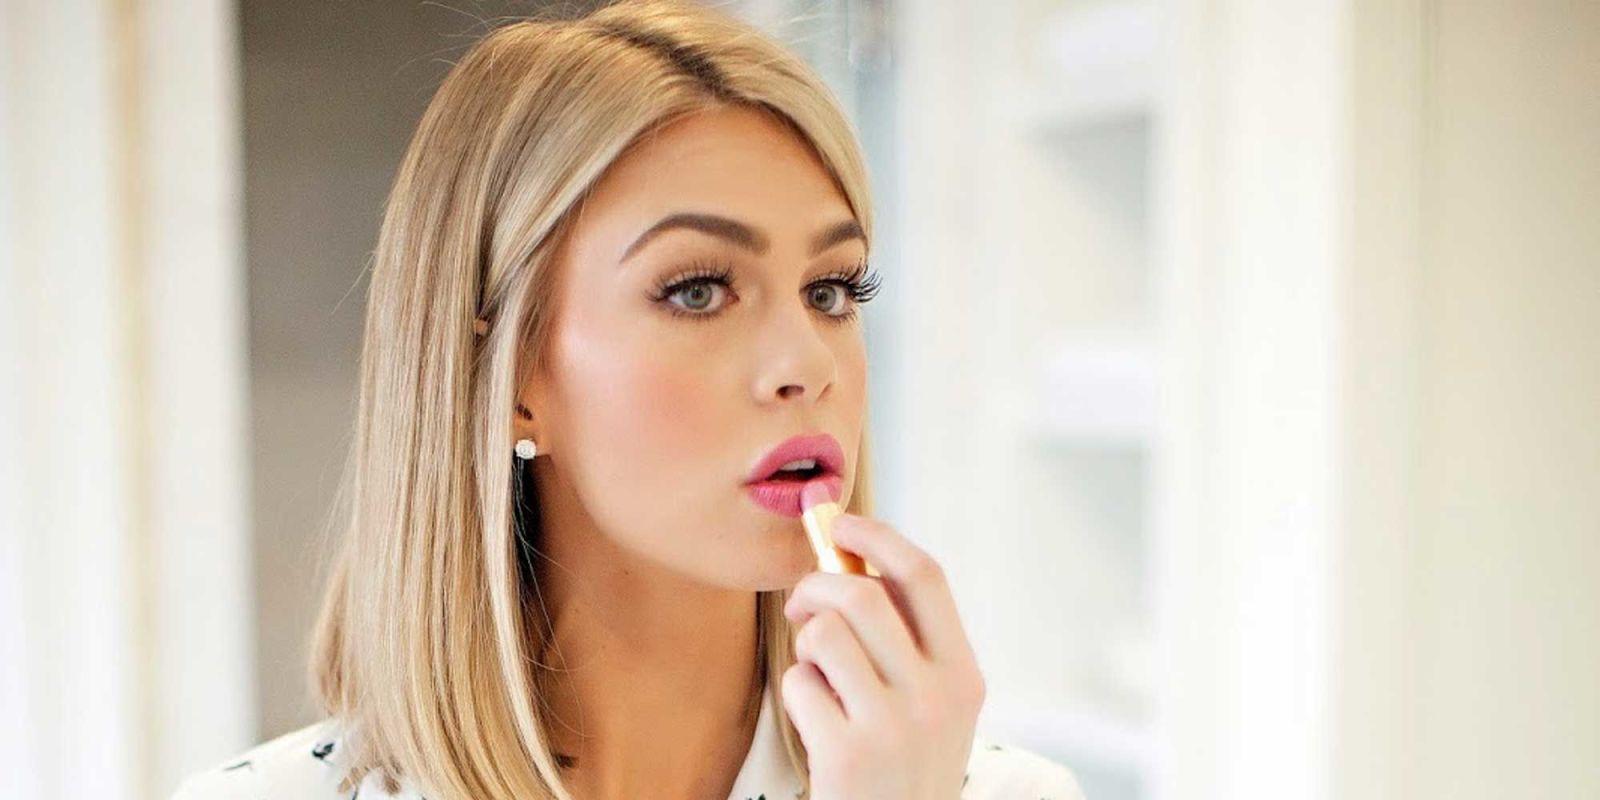 5 Secret Makeup Tips For Your Big Day